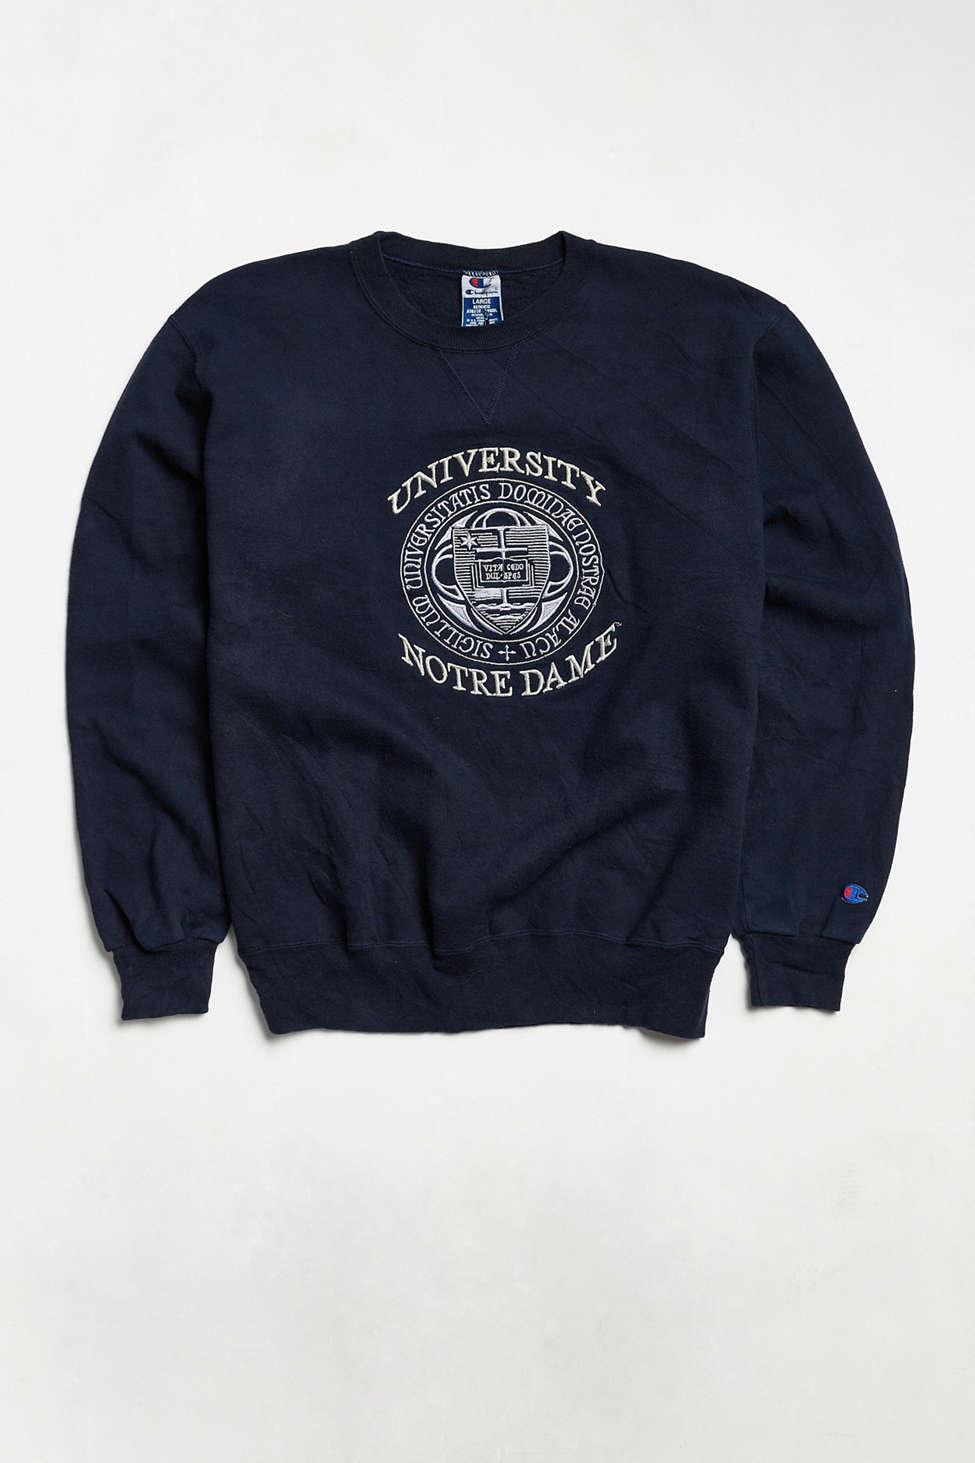 Vintage Champion University Of Notre Dame Crew Neck Sweatshirt